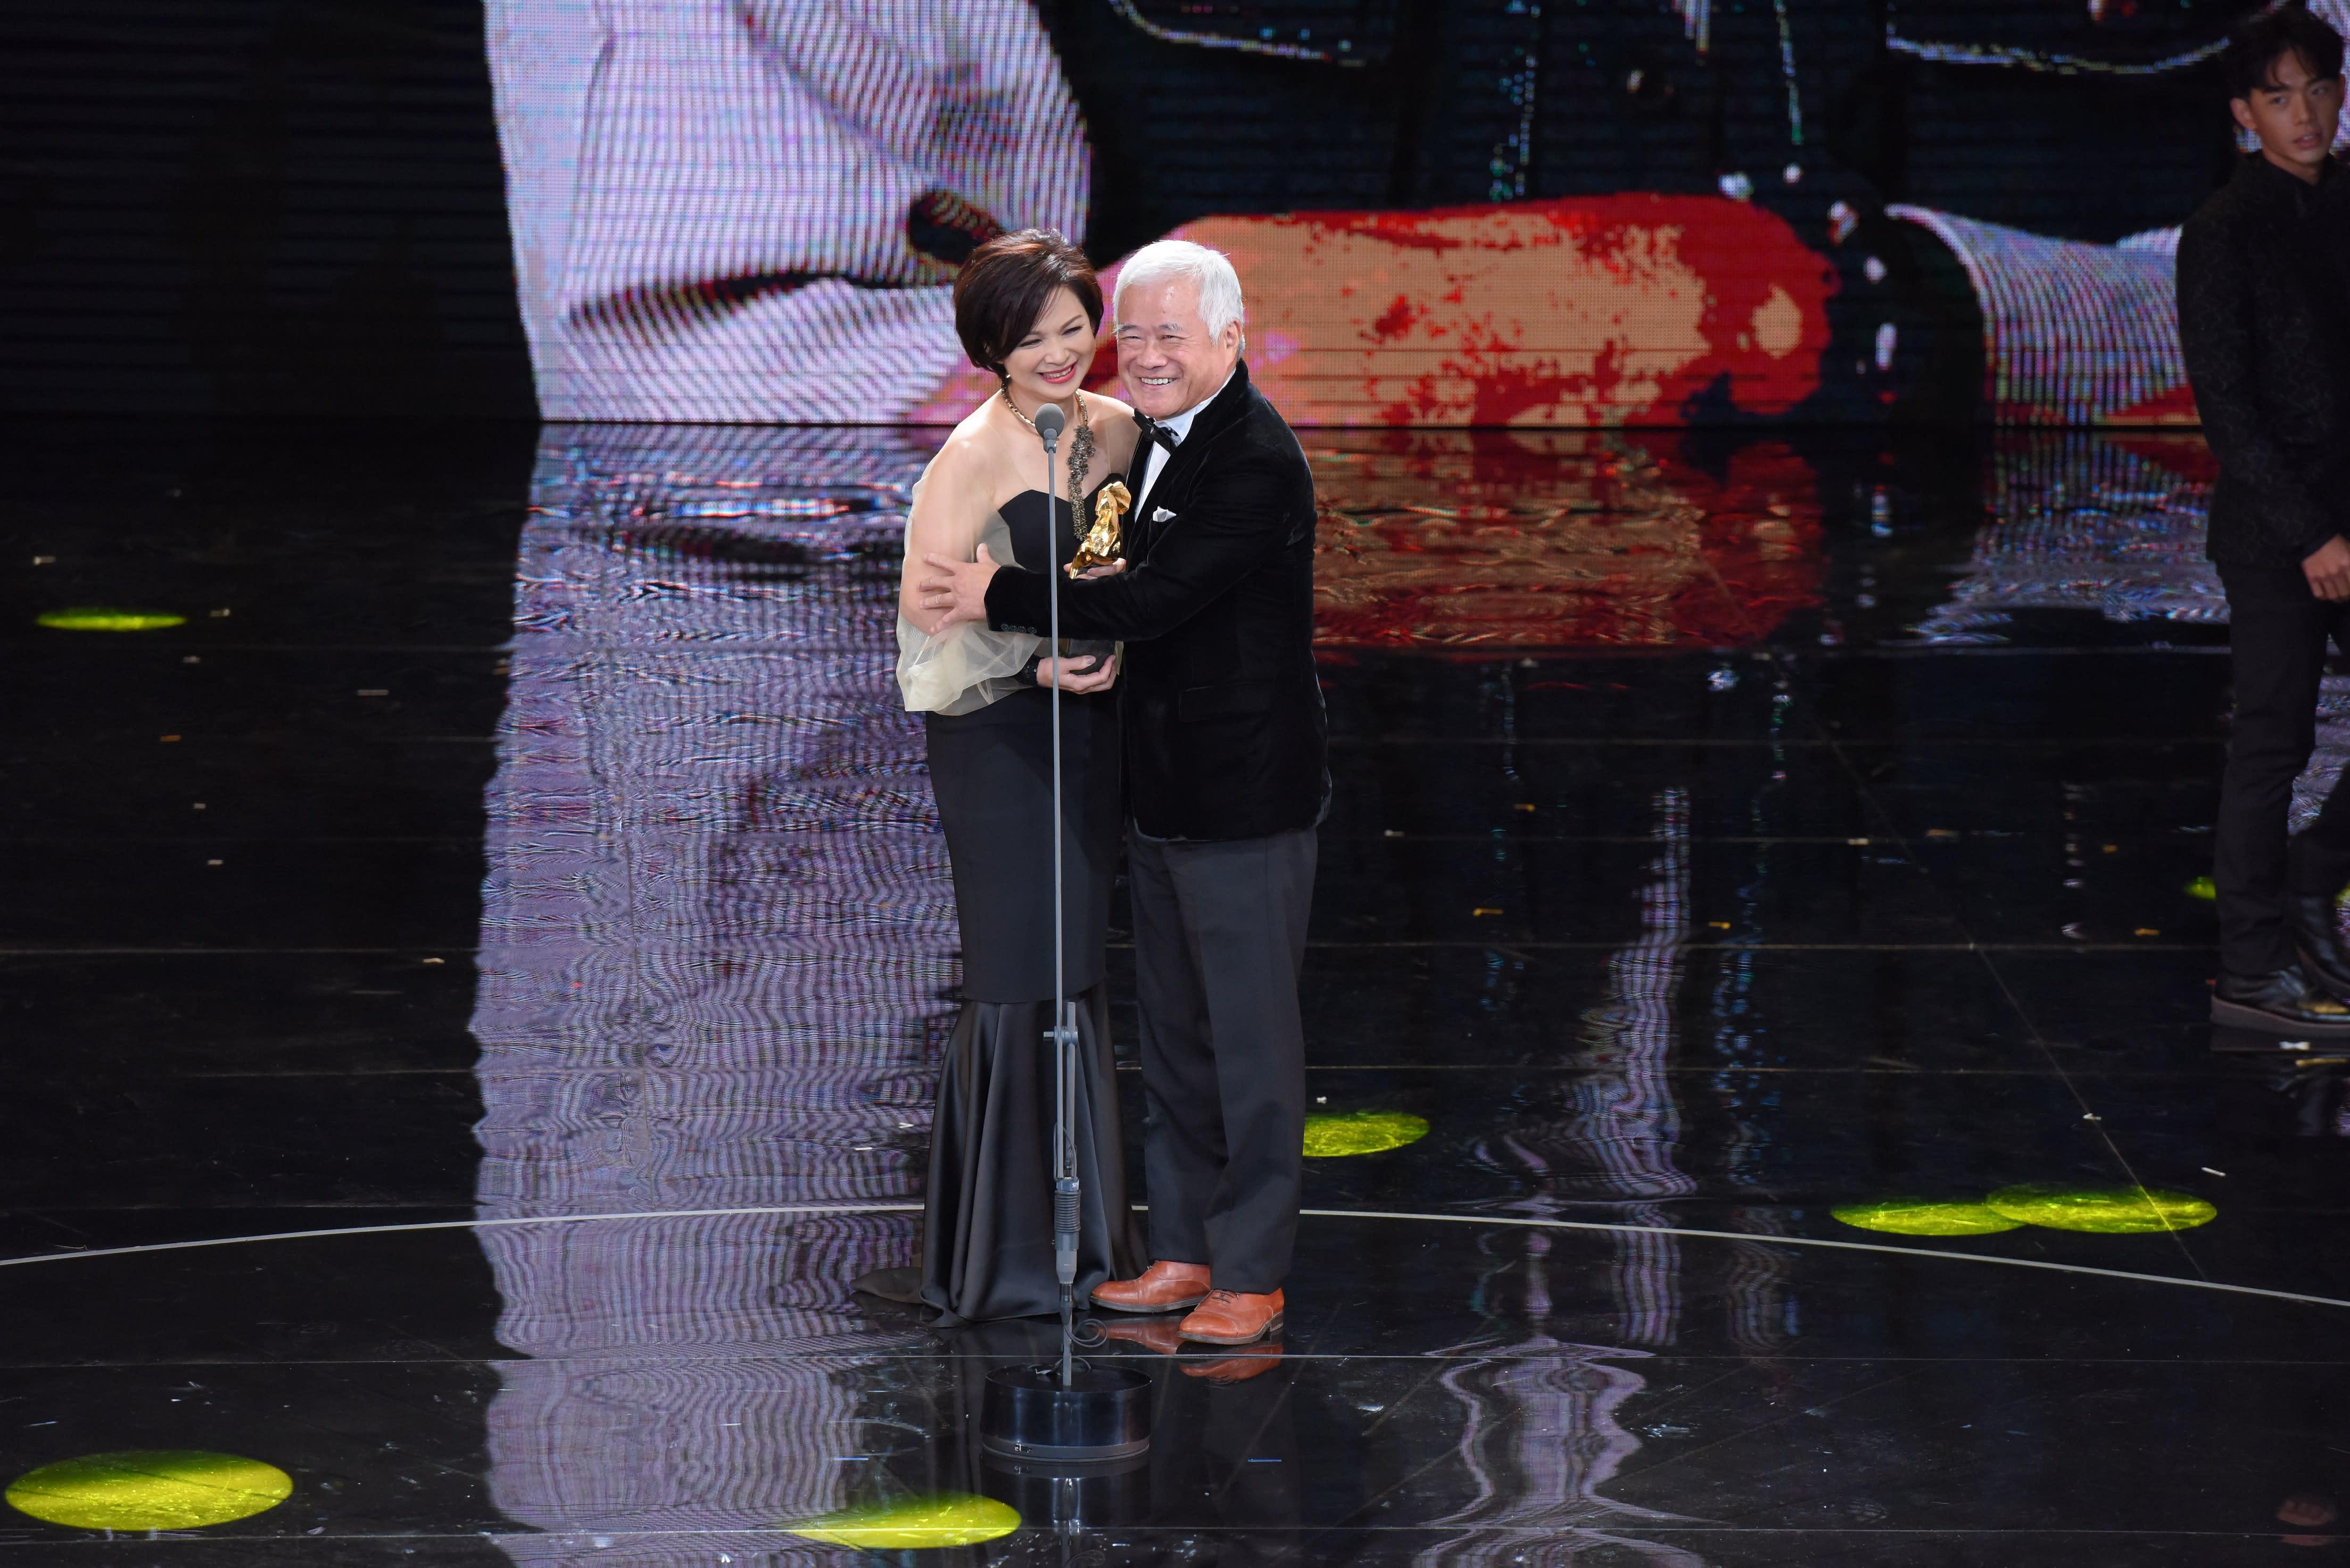 <p>第54屆金馬年度台灣傑出電影工作者,頒給國寶級擬音師胡定一。胡定一登台領獎時與頒獎人楊貴媚(左)擁抱致意。(影像:金馬執委會提供) </p>